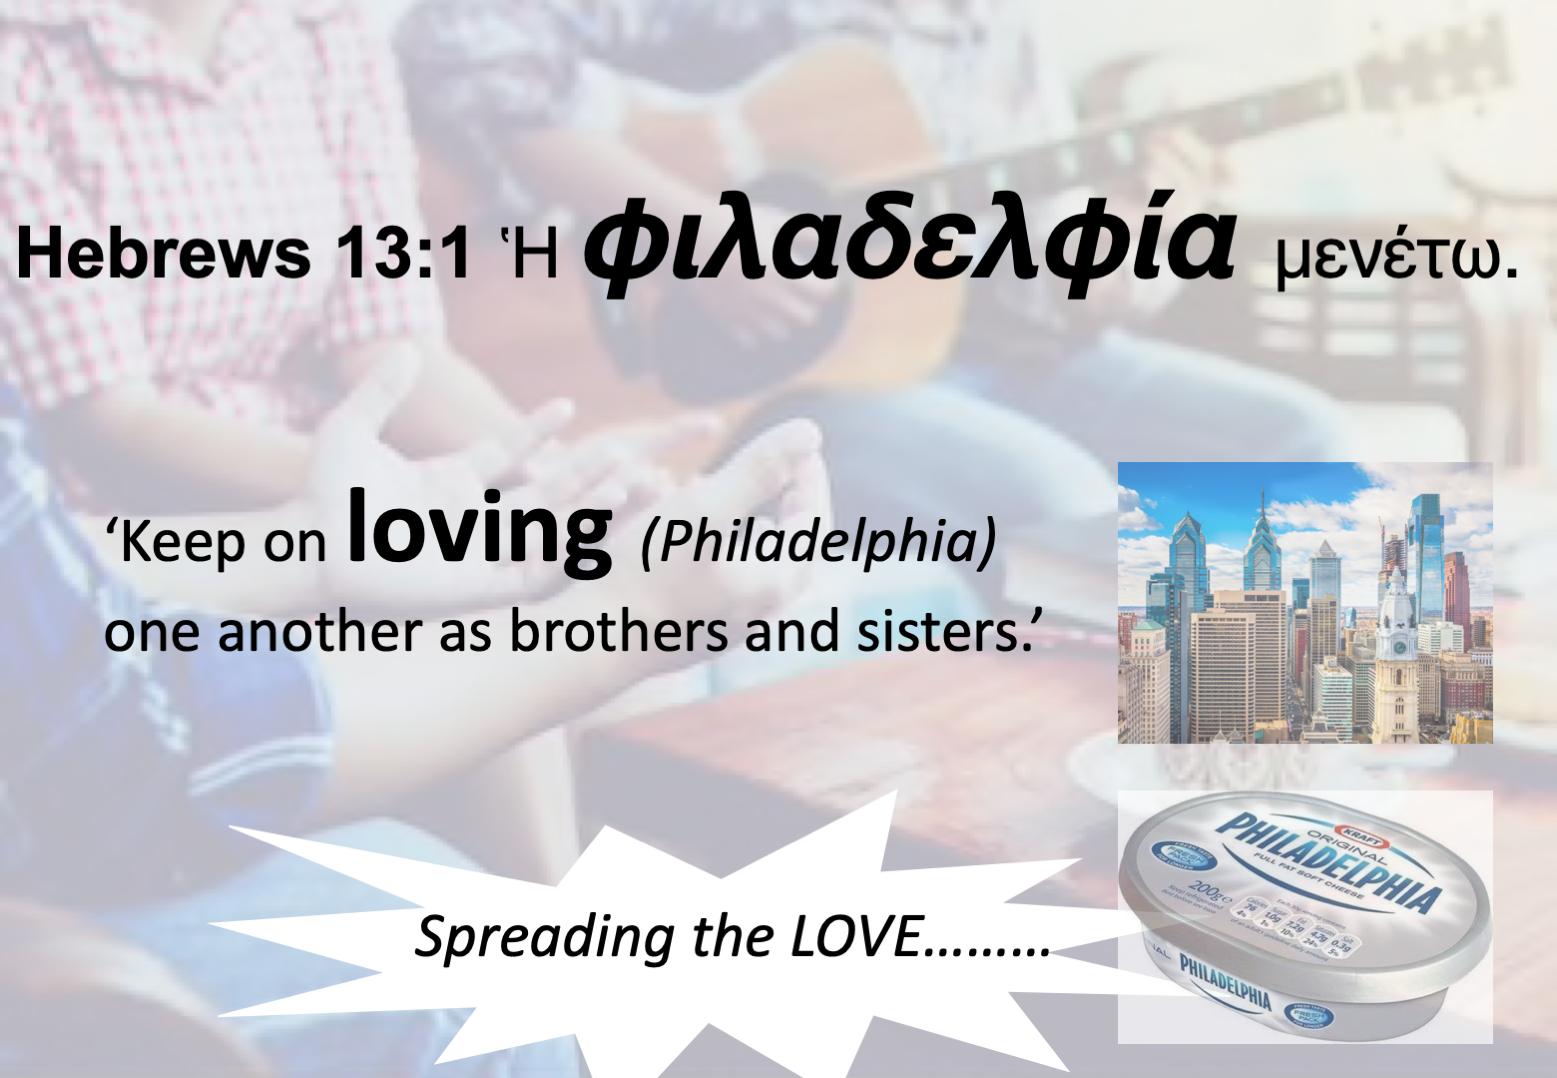 Final Words: Hebrews 13